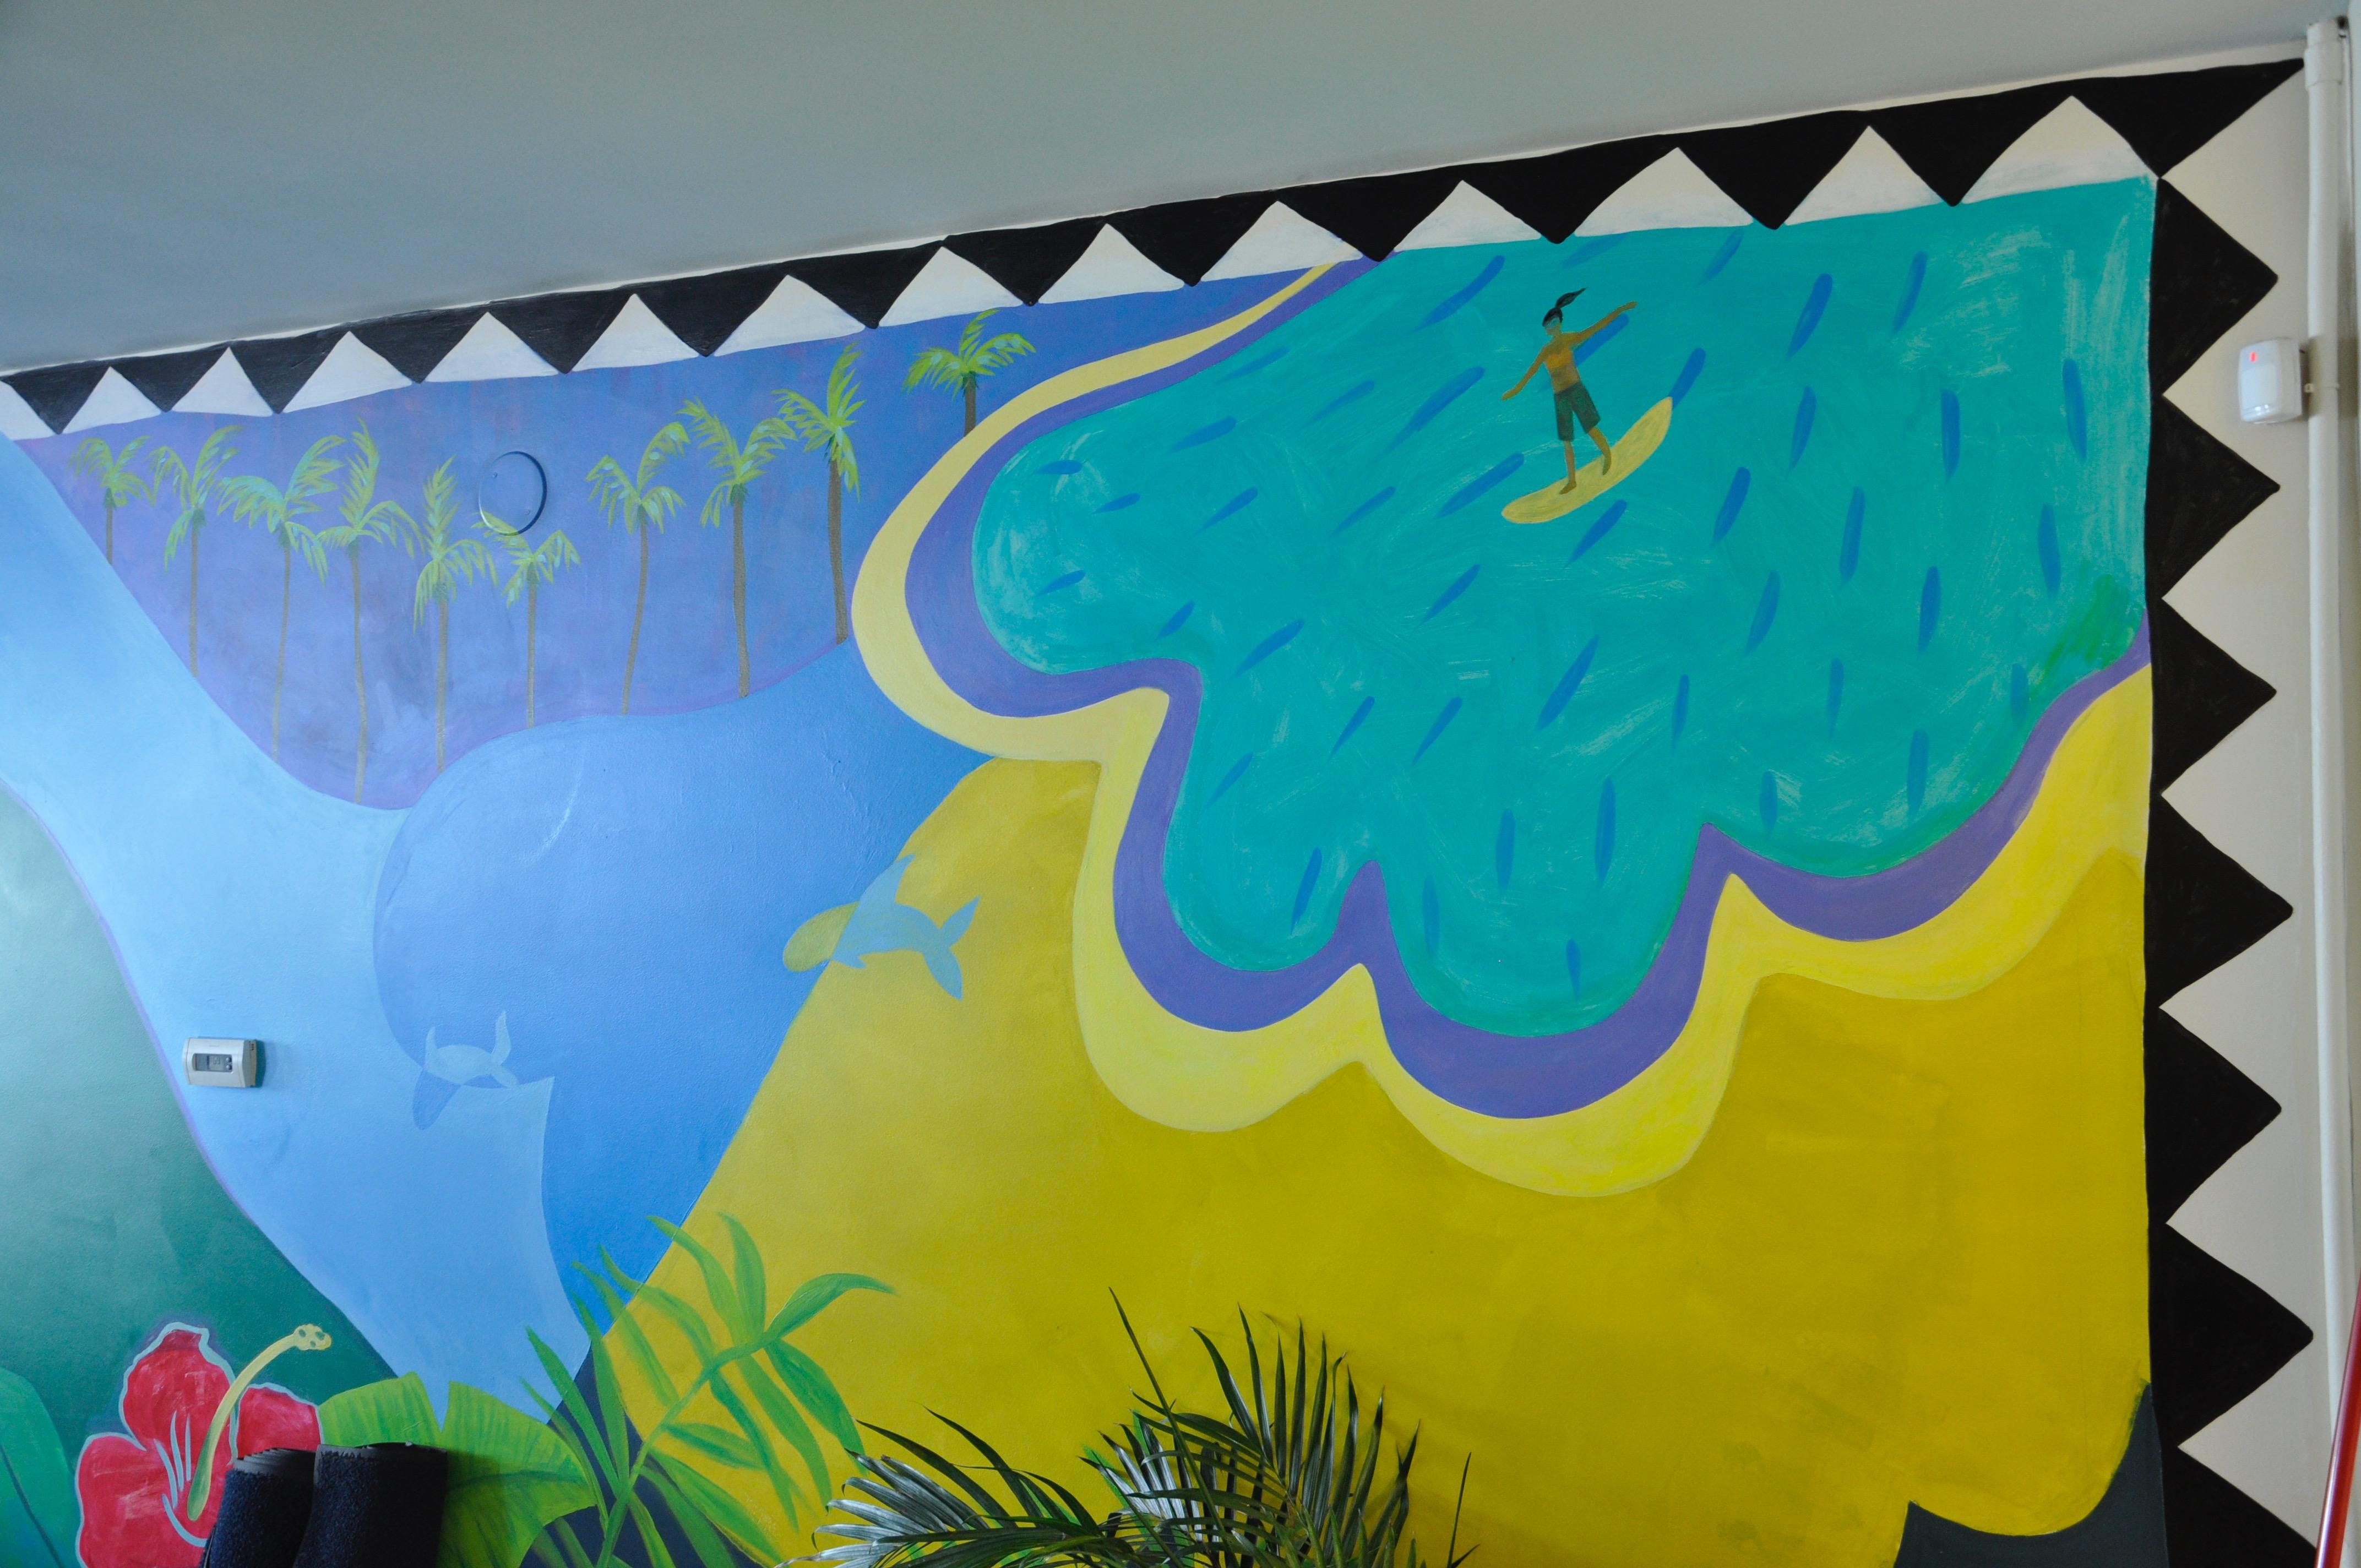 Manoa mural